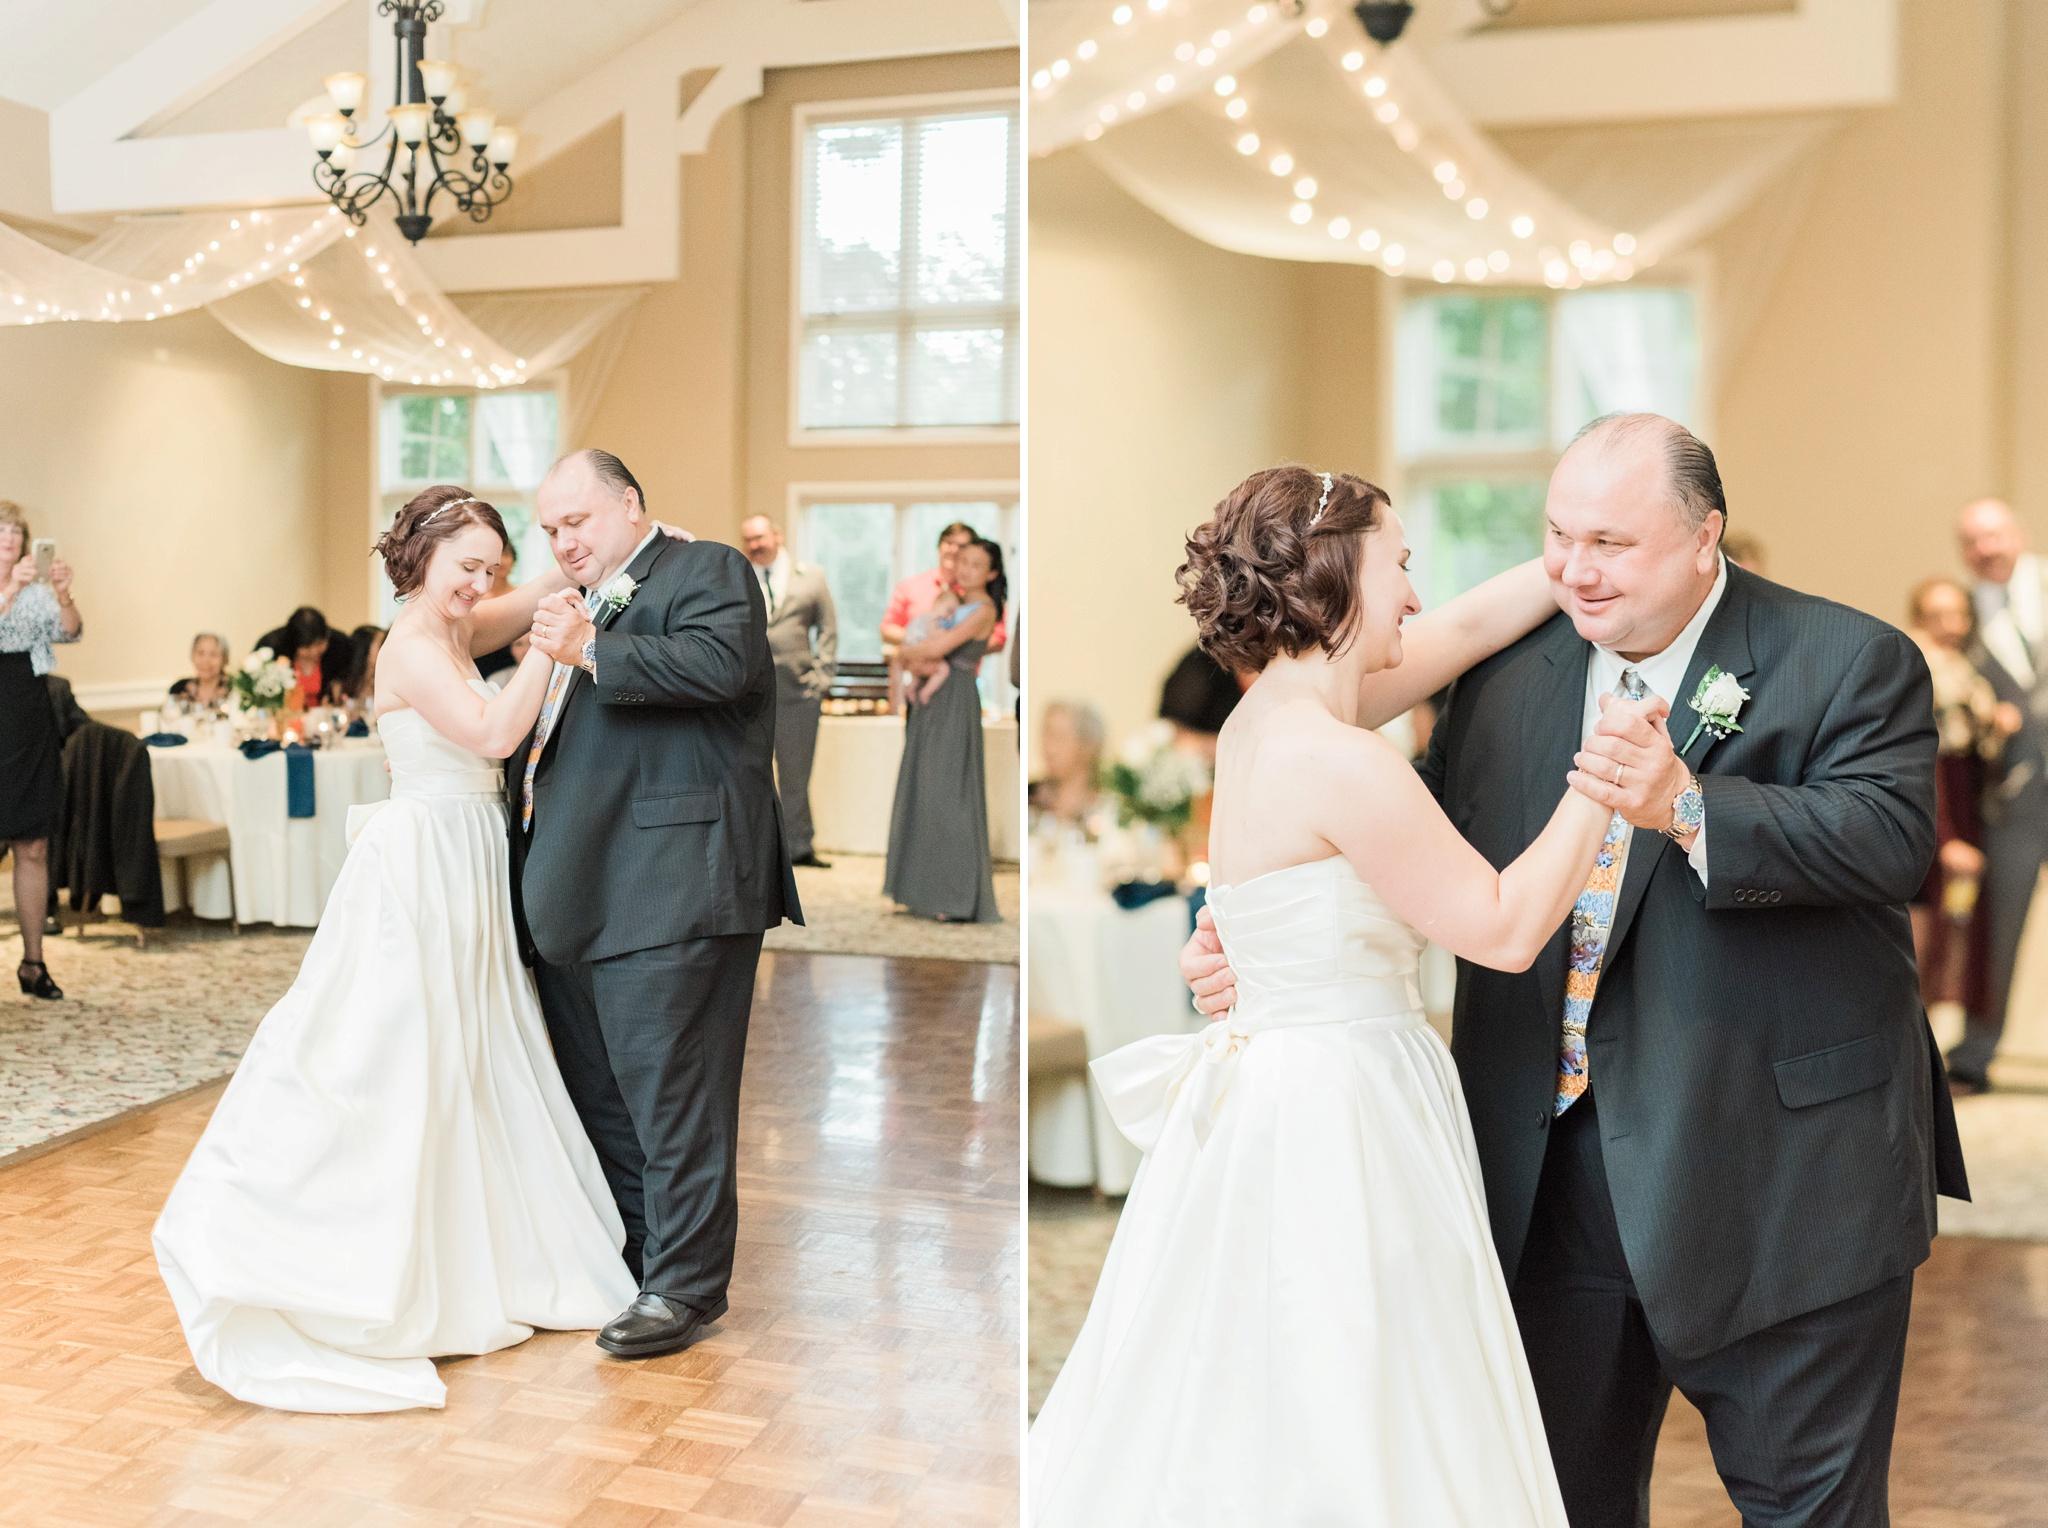 brookside-golf-country-club-wedding-columbus-ohio-144.jpg